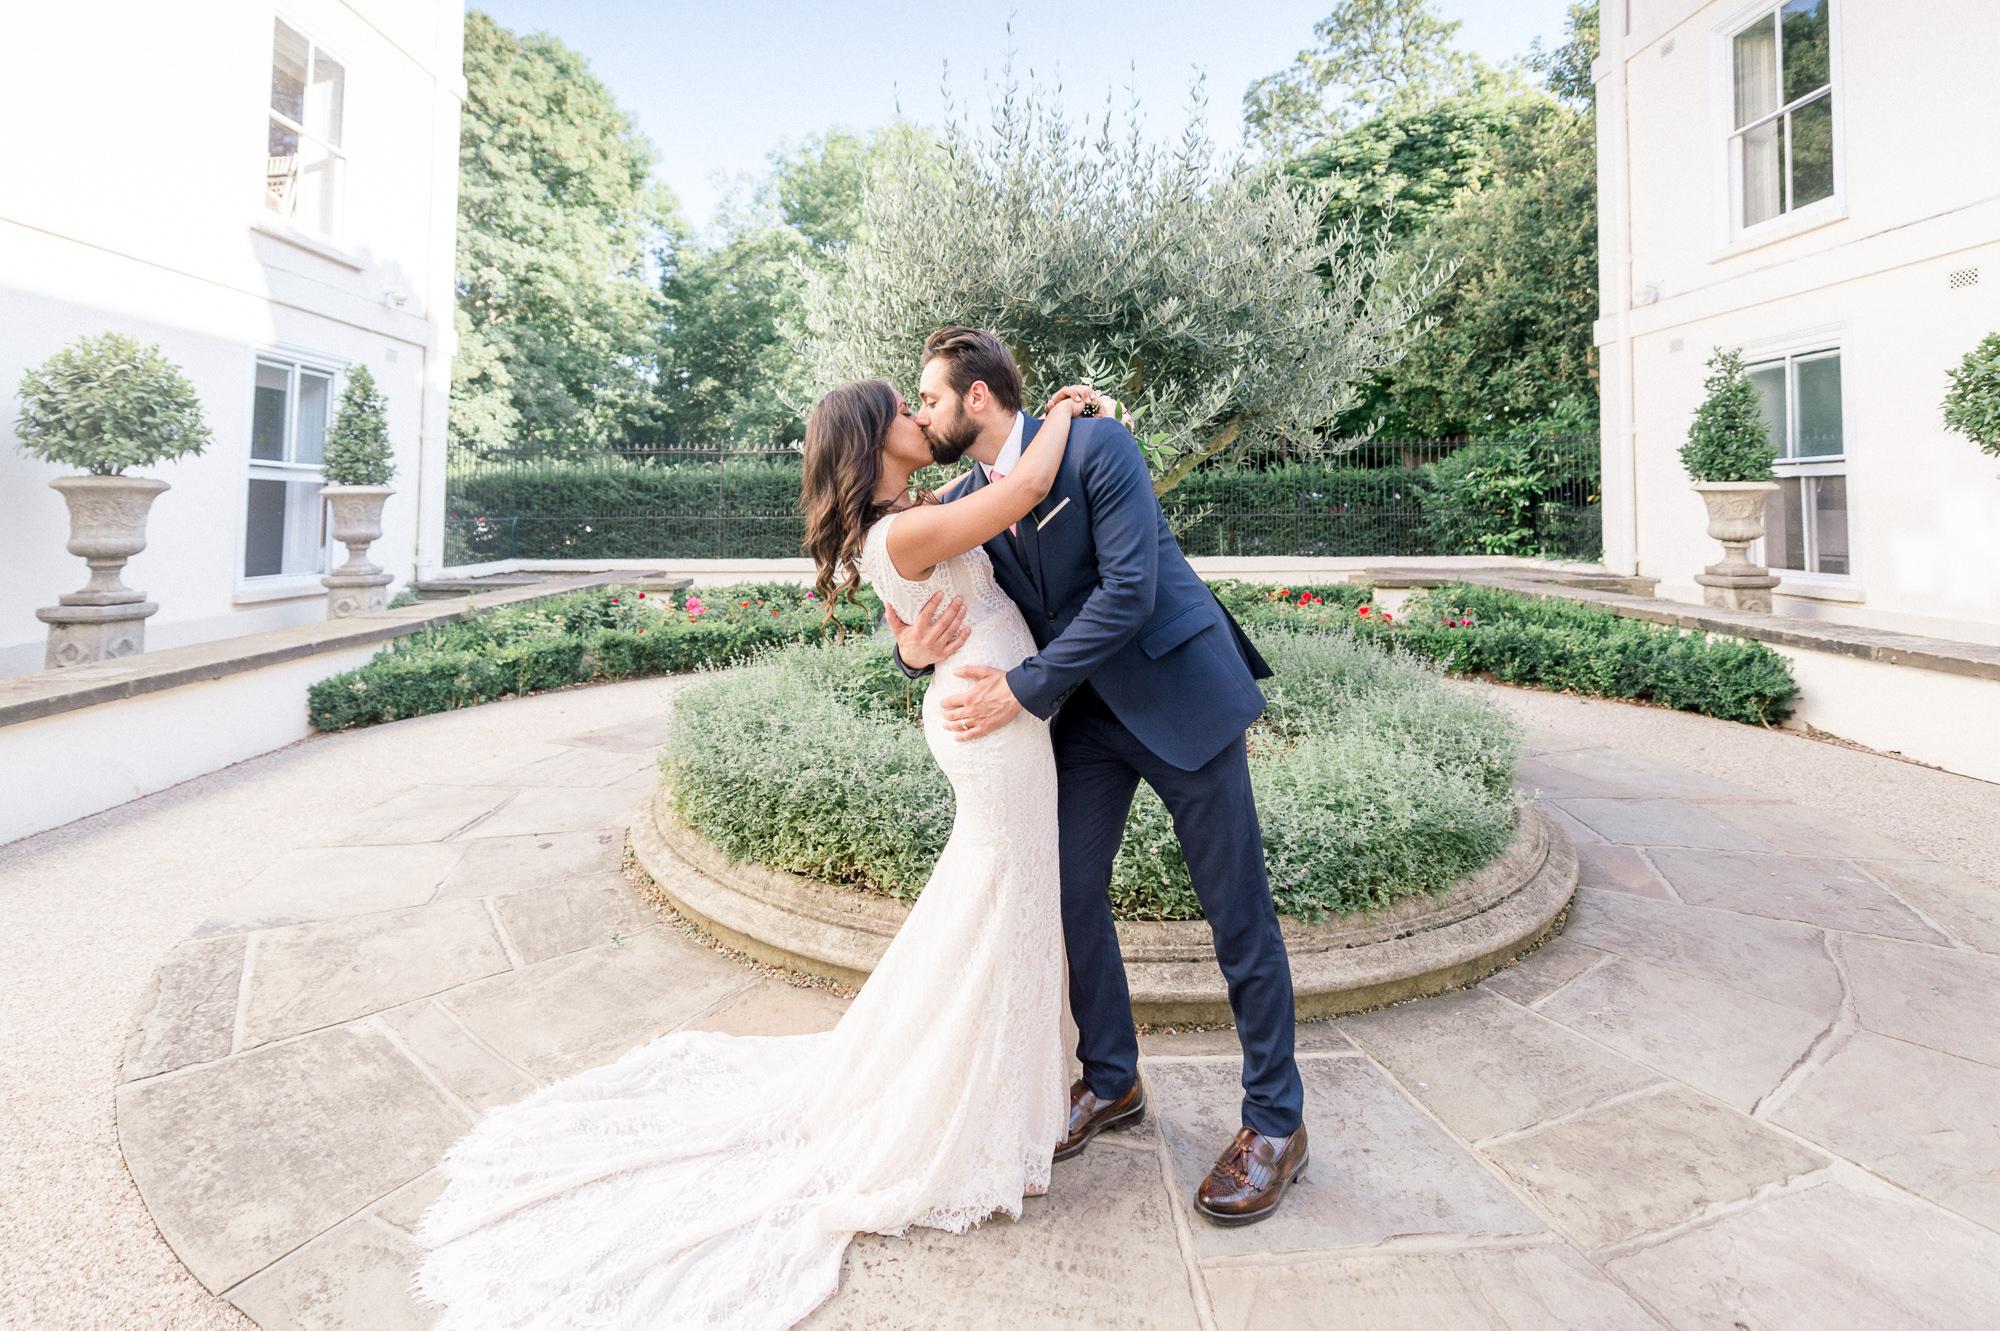 London wedding photographer-Erika Rimkute Photography-120.jpg